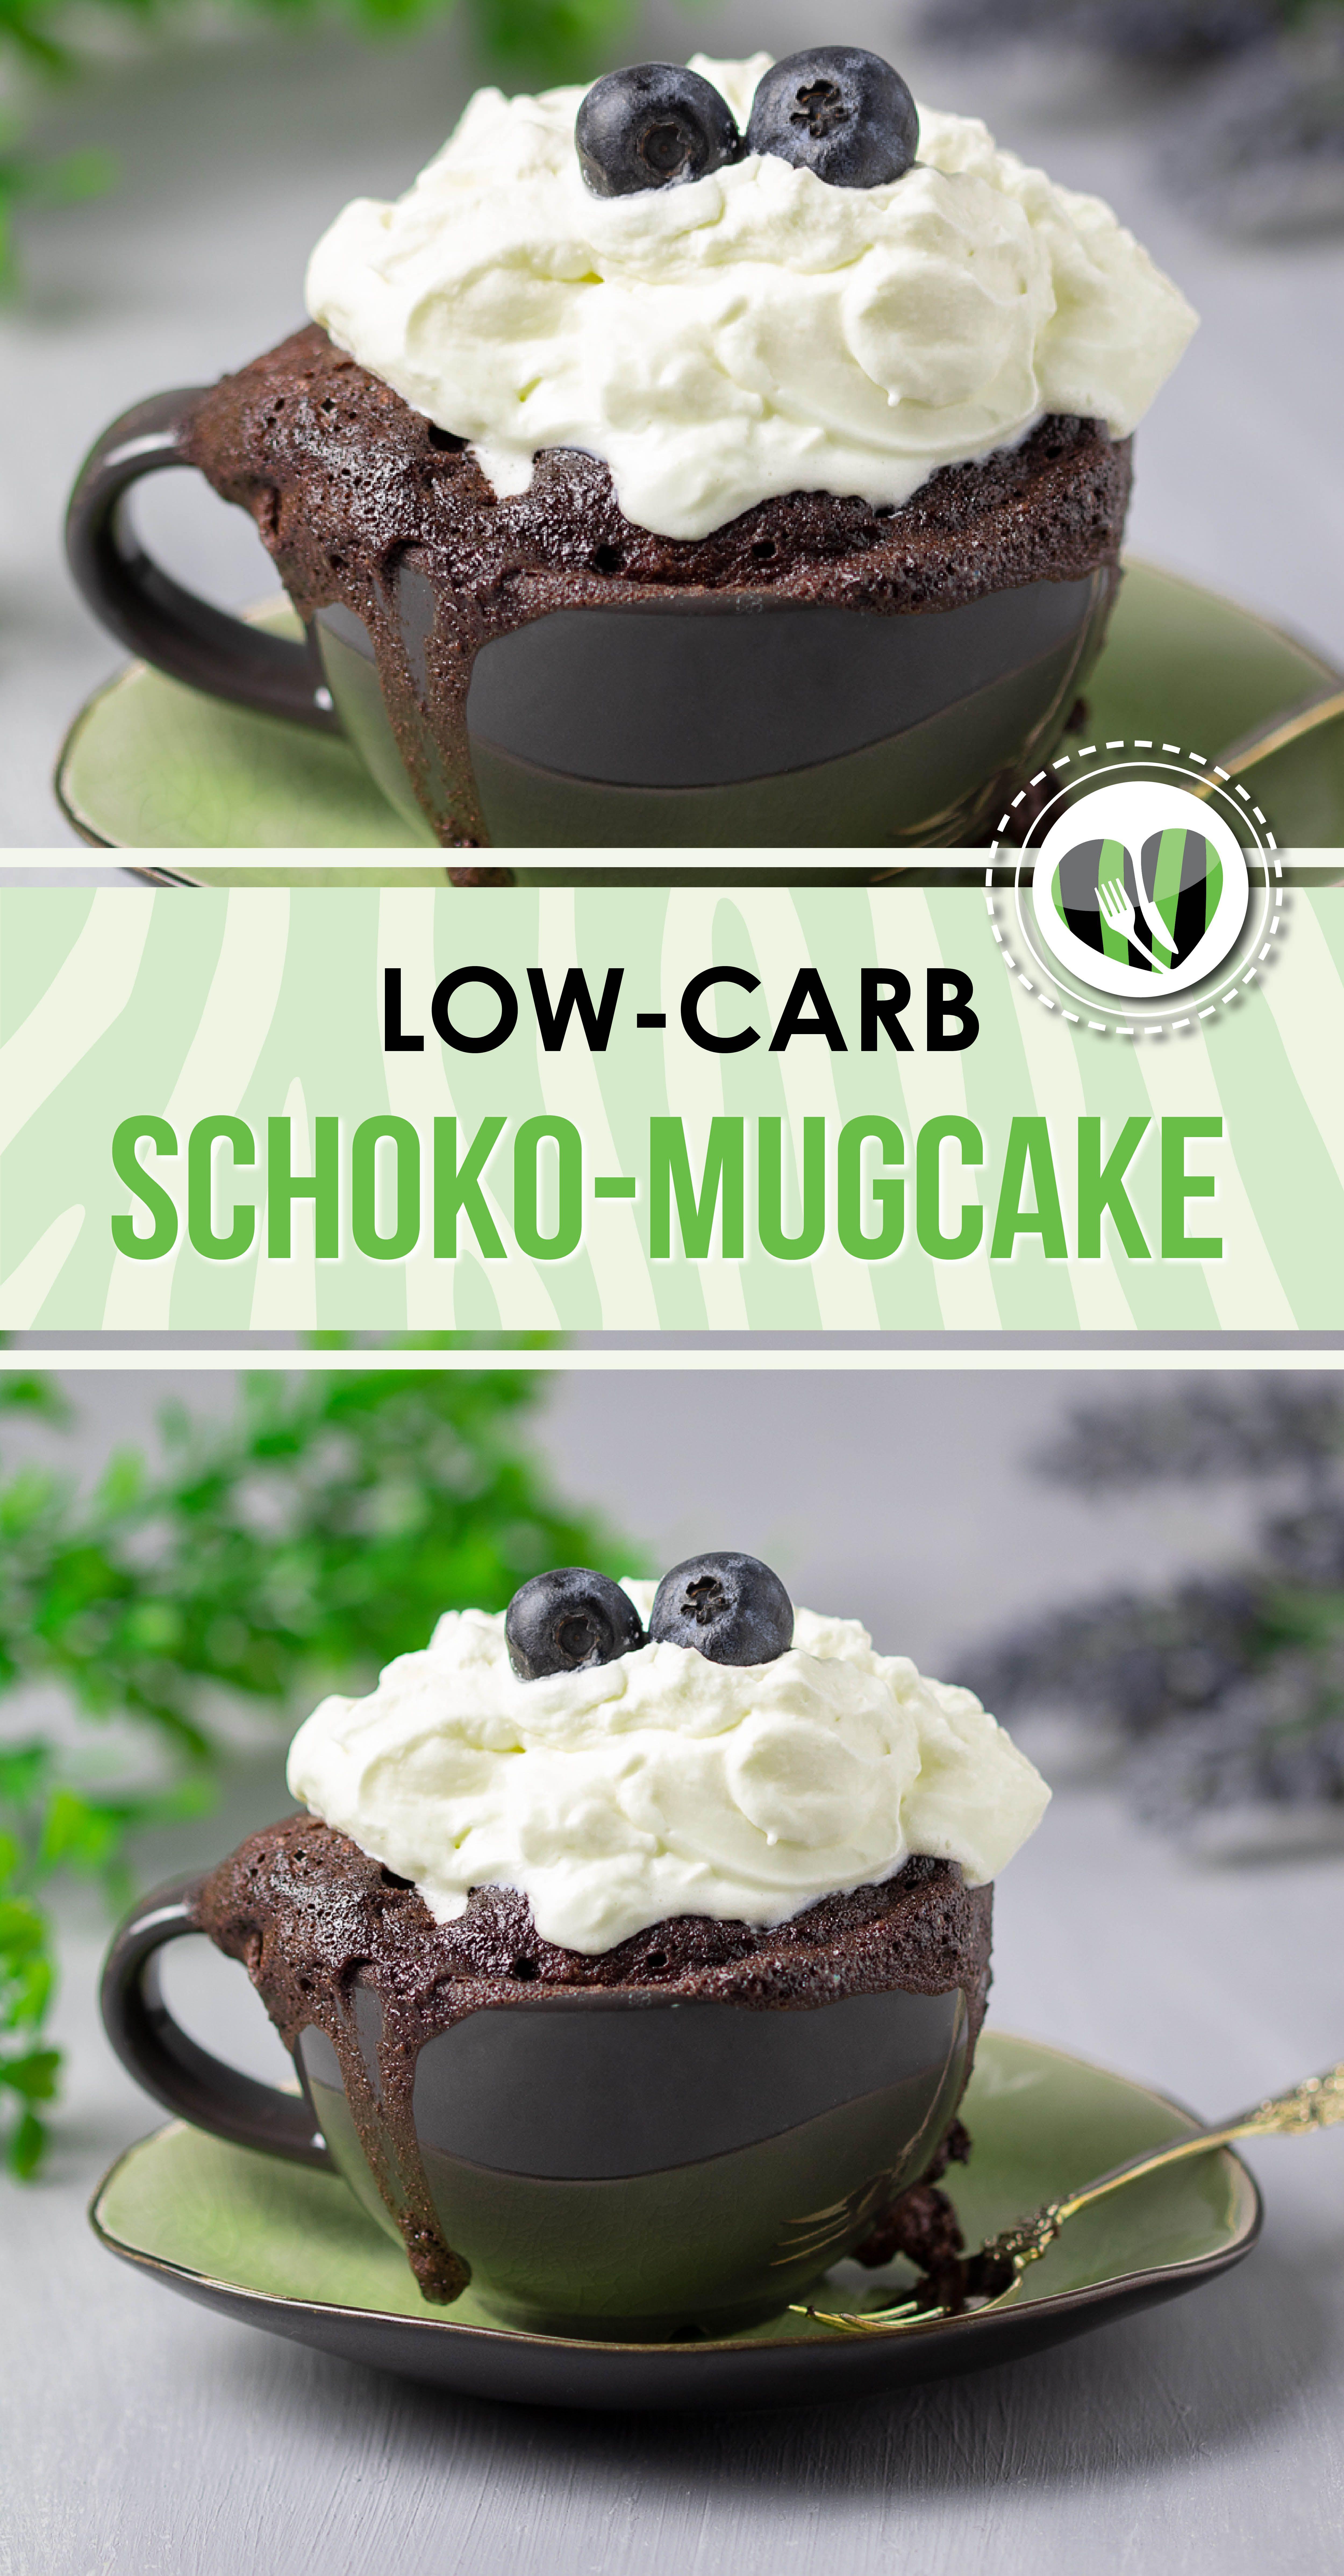 Schoko-Mugcake mit Blaubeeren #lowcarbmeals